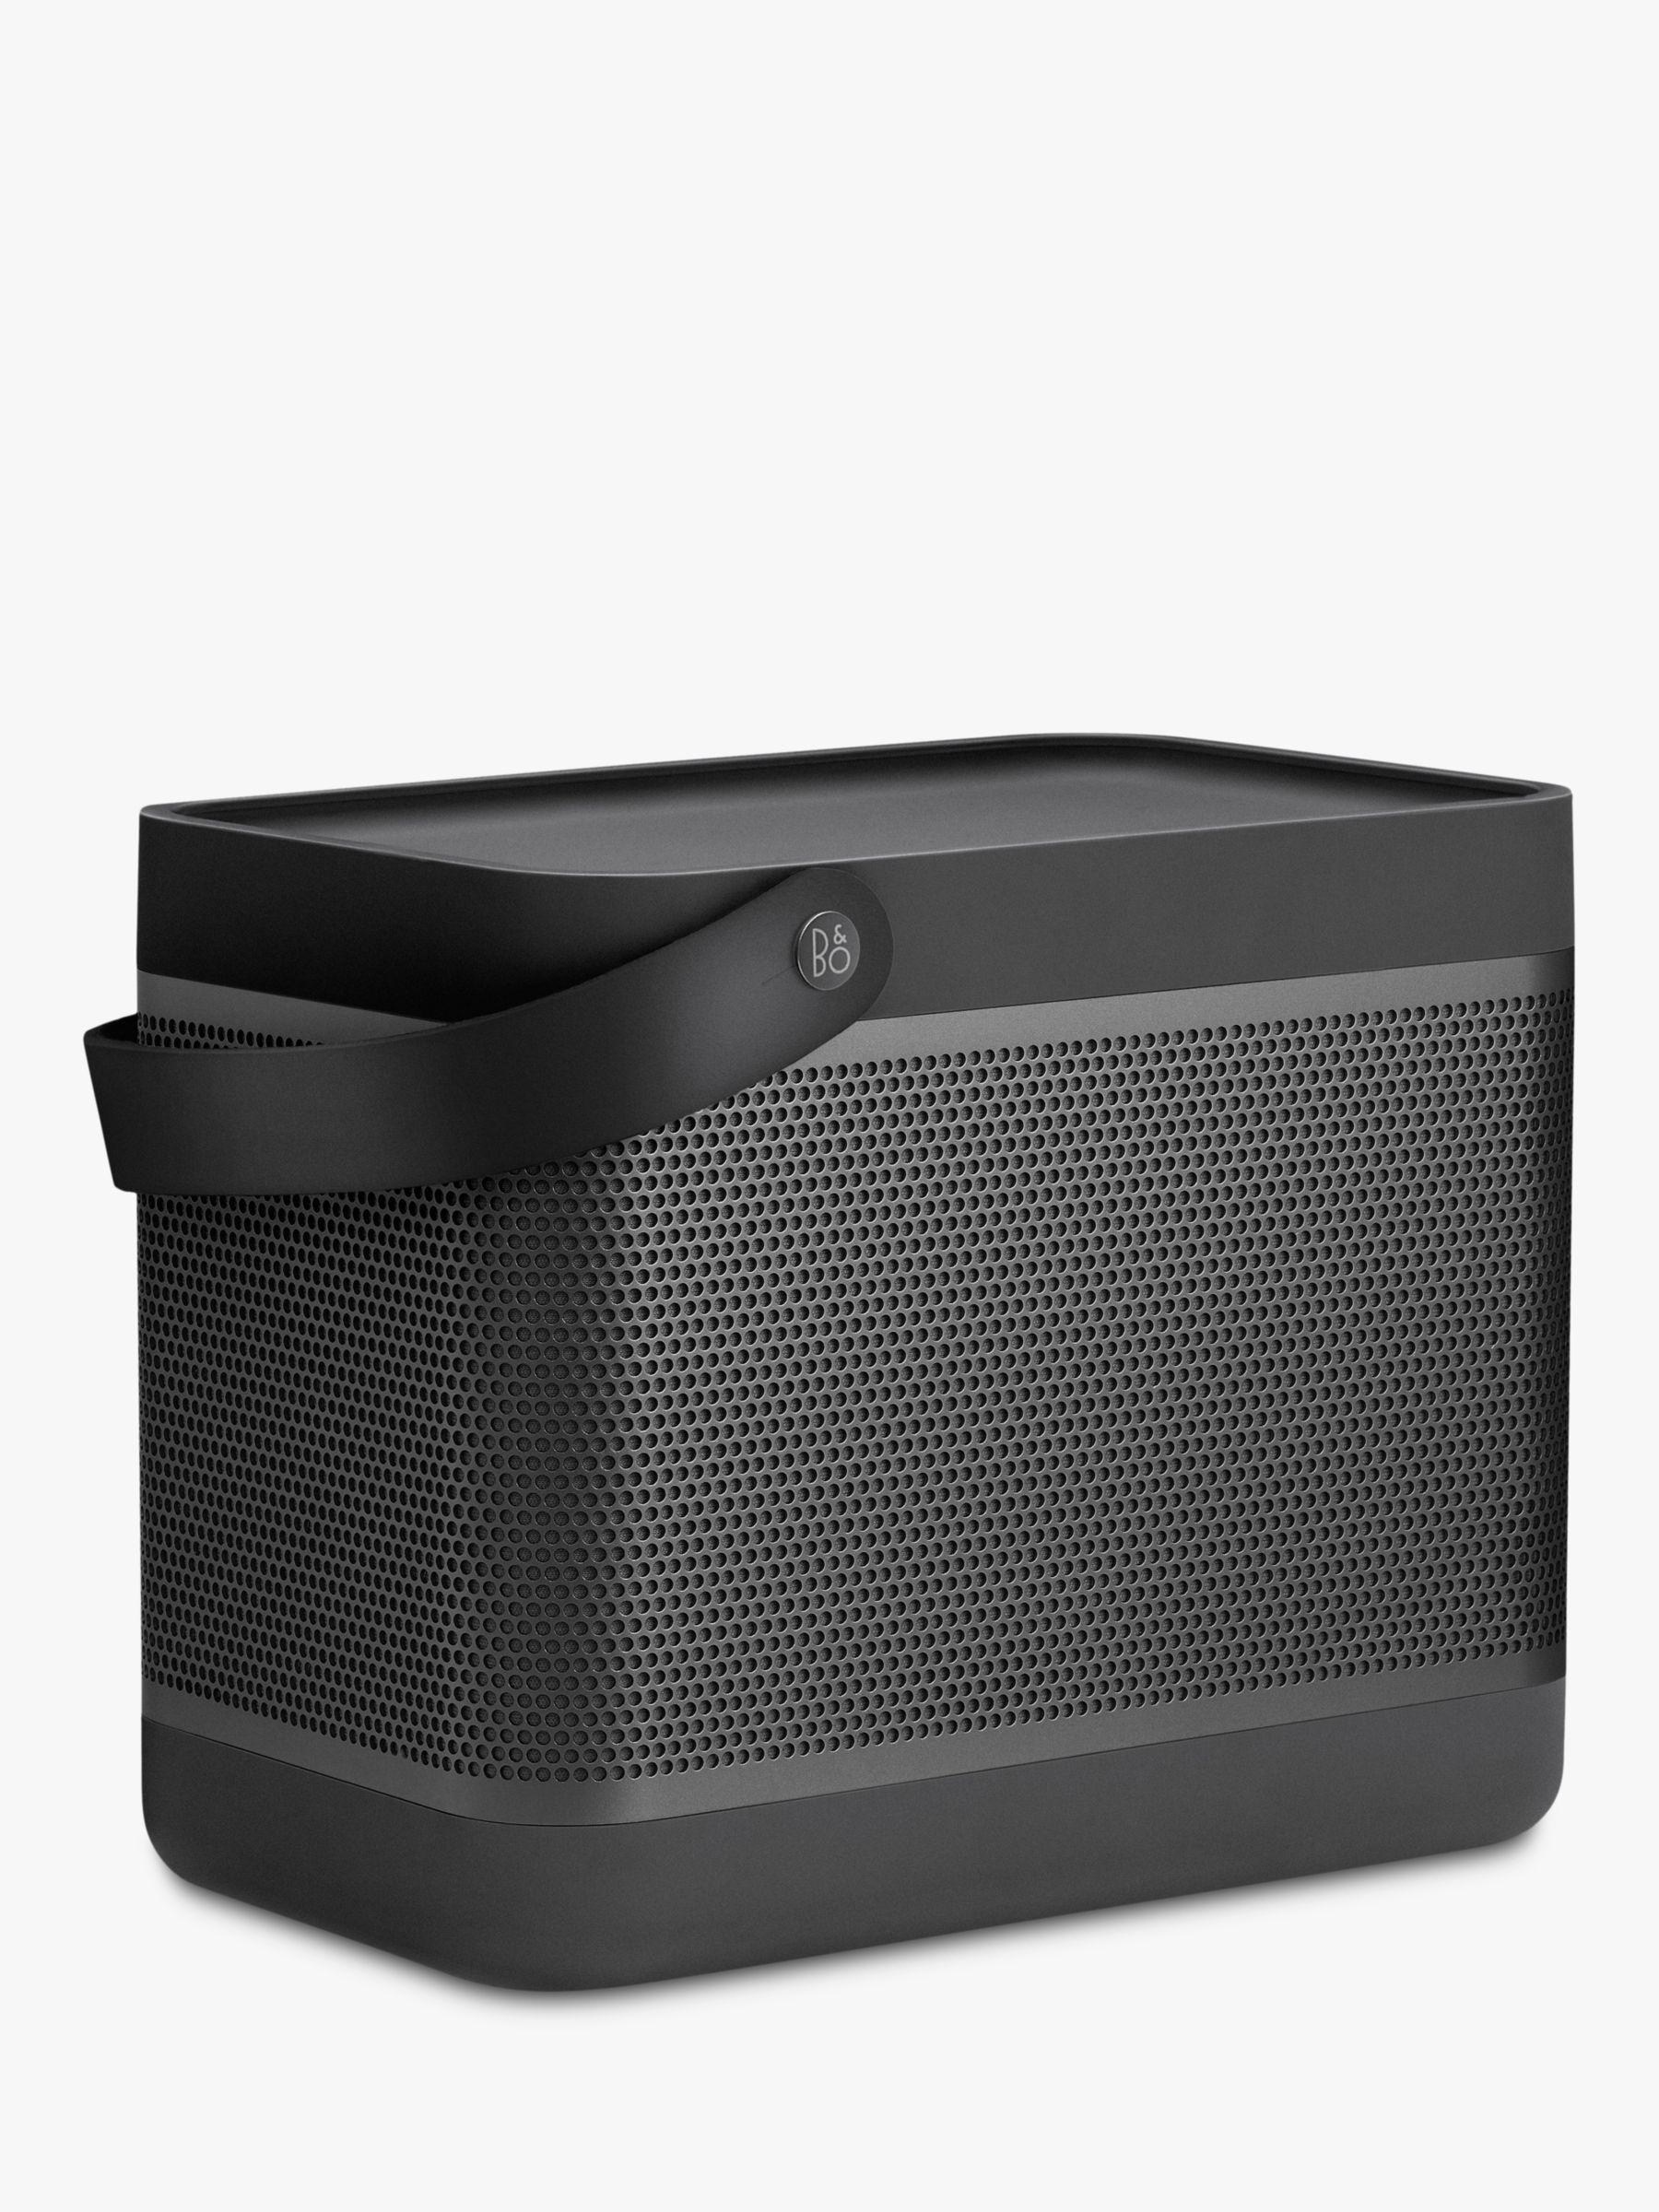 Bang & Olufsen Bang & Olufsen Beolit17 Portable Bluetooth Speaker